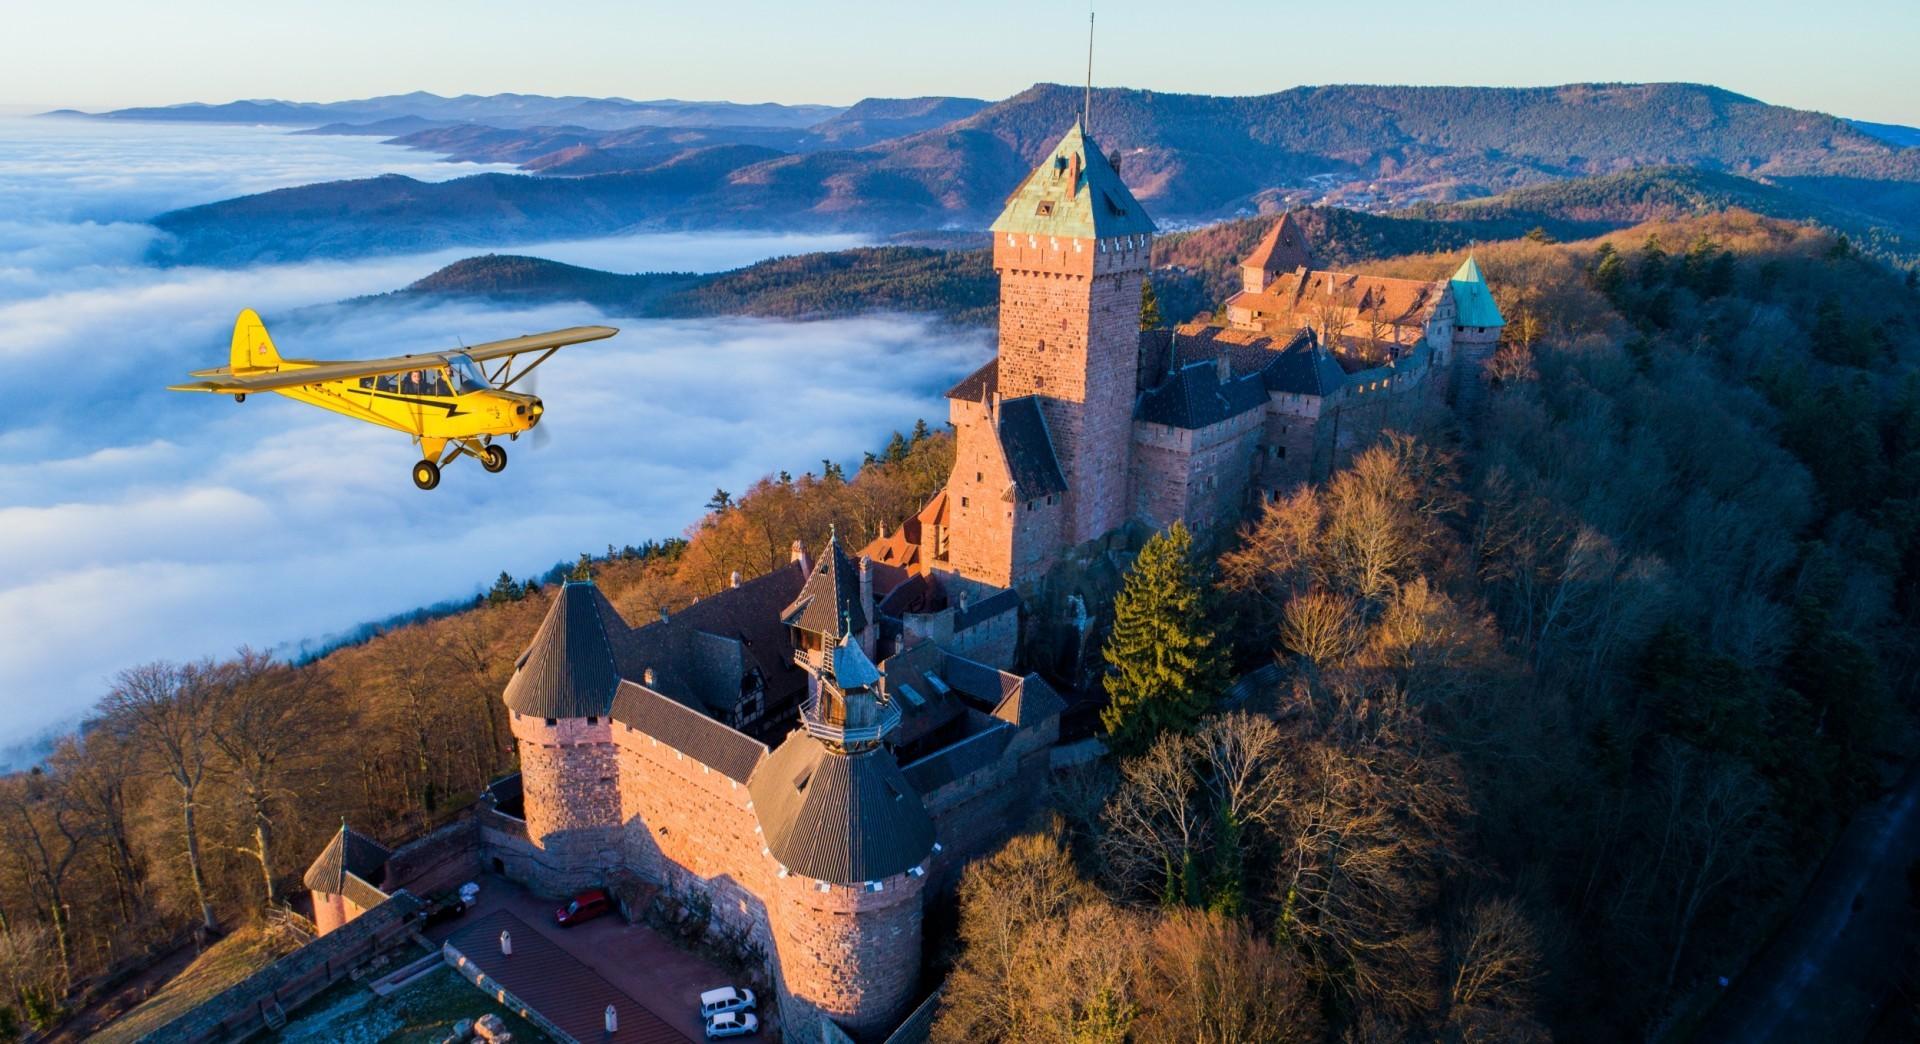 chateau_du_haut_koenigsbourg_c_tristan_vuano_2_1_.jpg